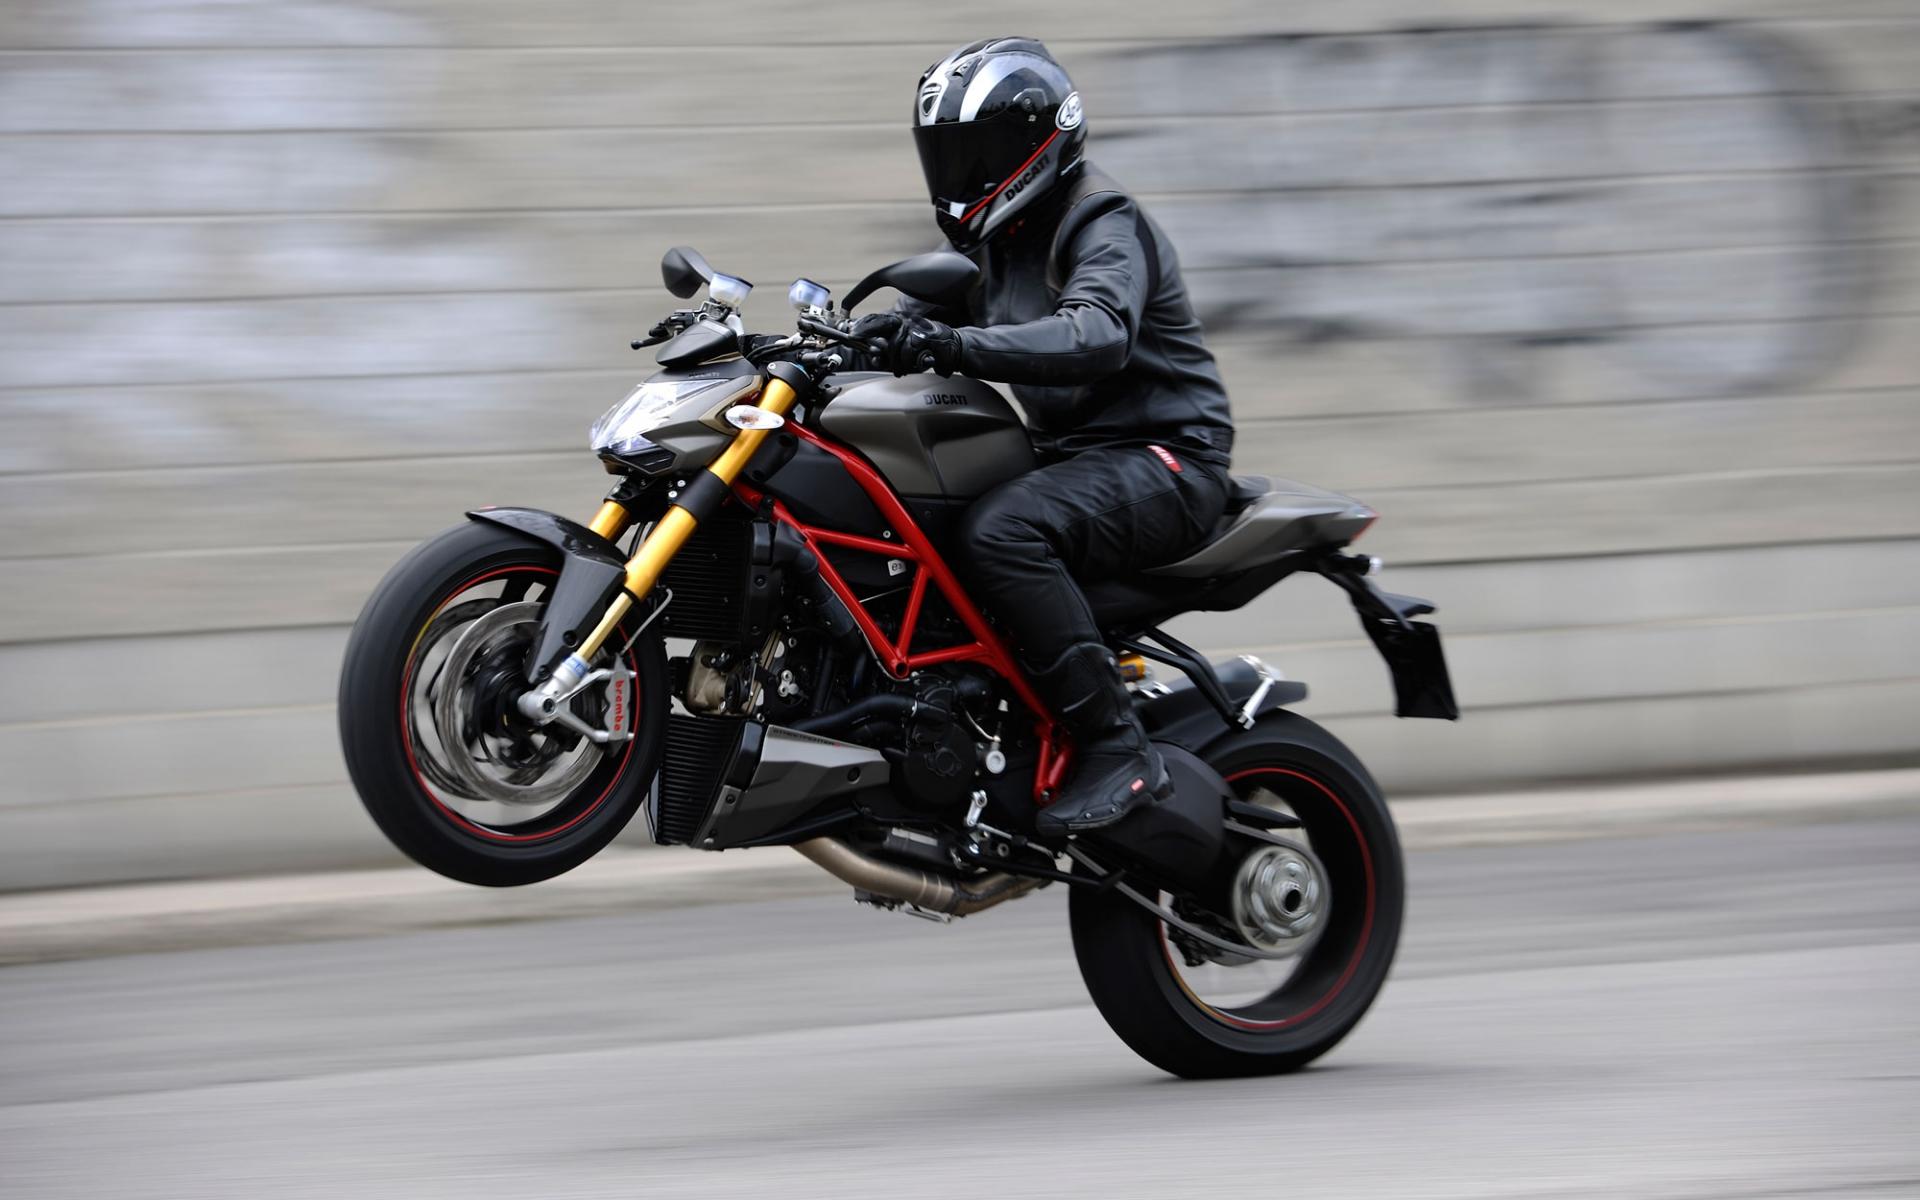 Caballito en Ducati - 1920x1200